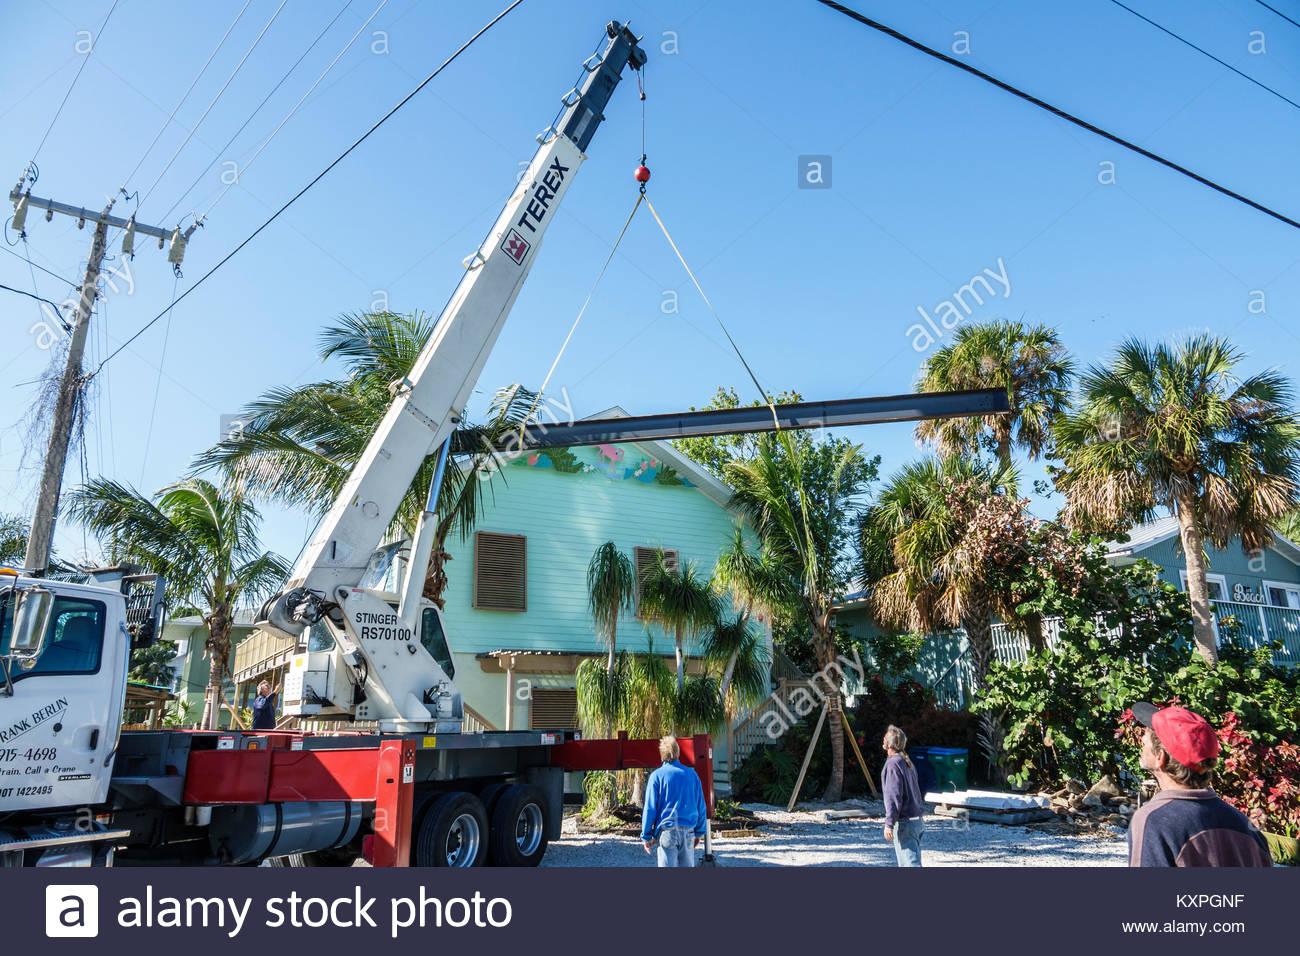 Florida Anna Maria Island Holmes Beach Terex Stinger RS70100 Boom Truck Telescopic Crane Lifting Steel Girder